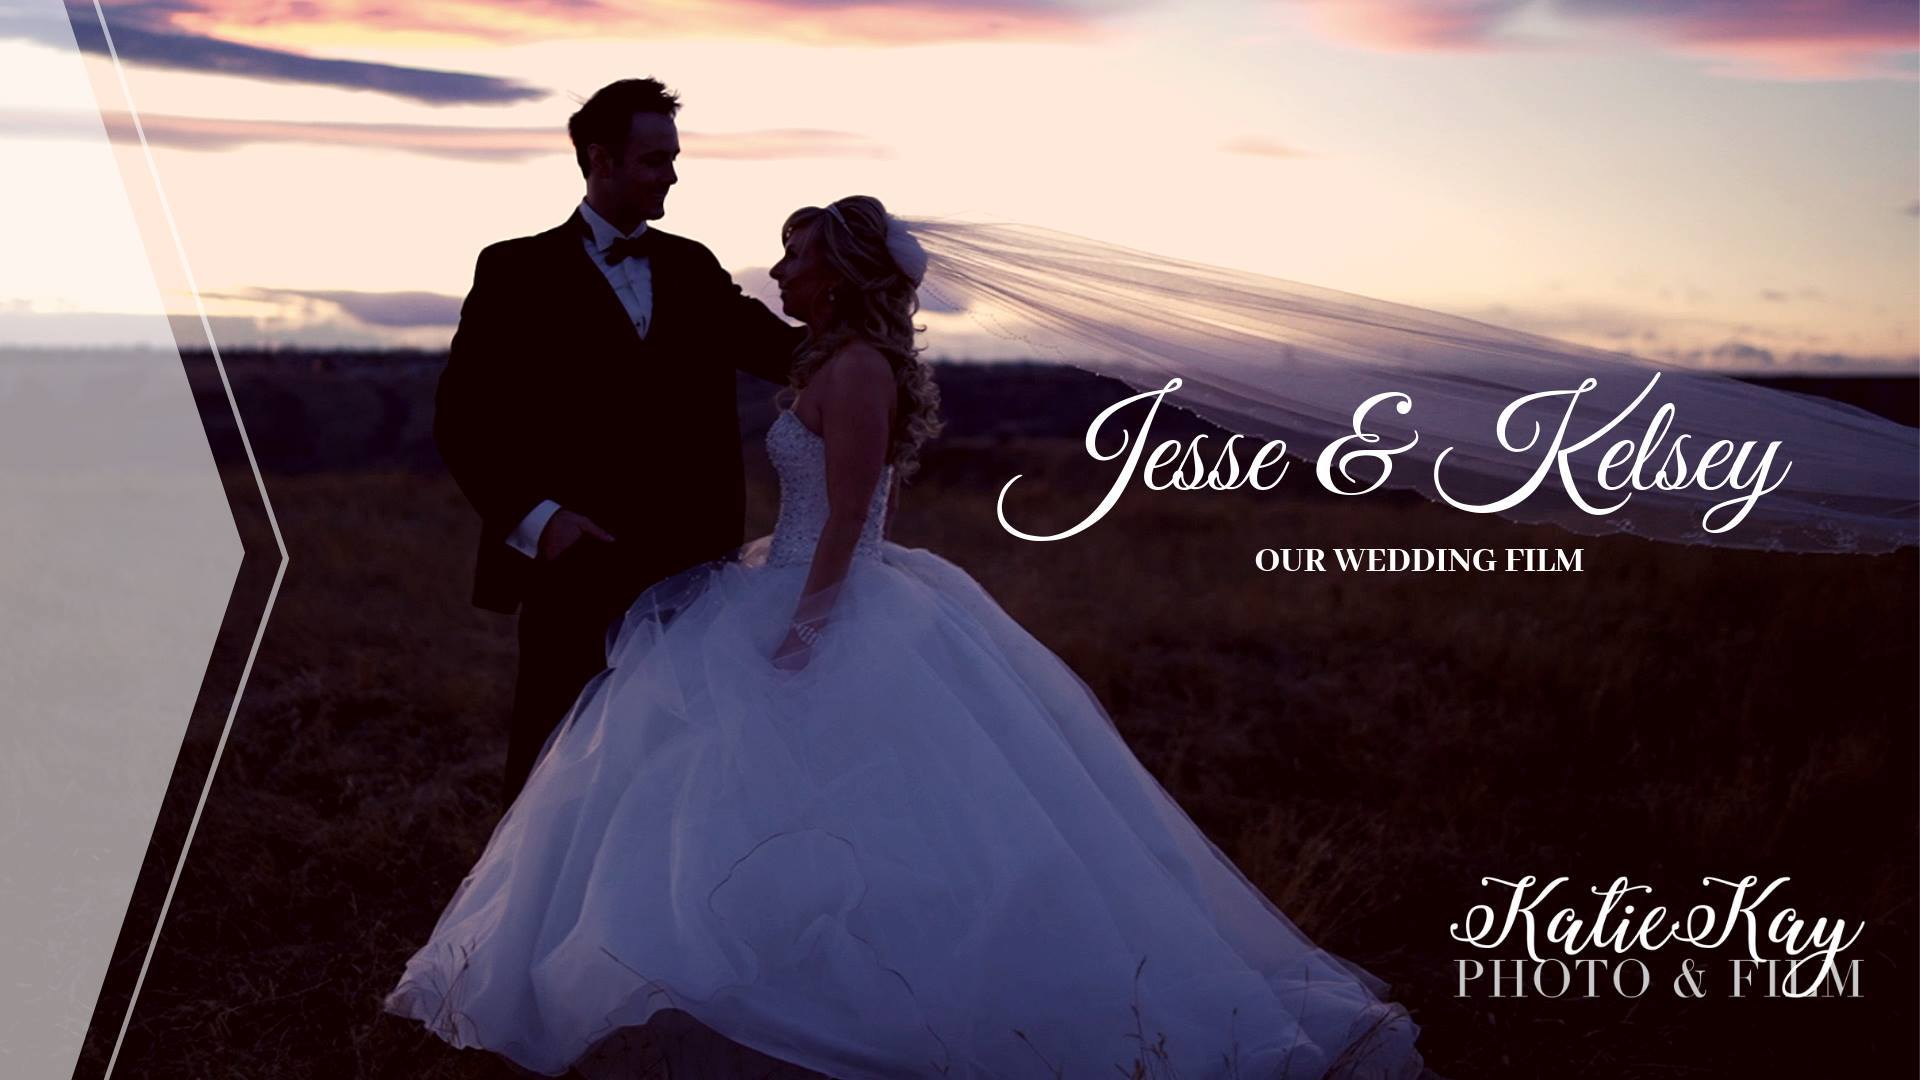 Jesse & Kelsey's Wedding Film